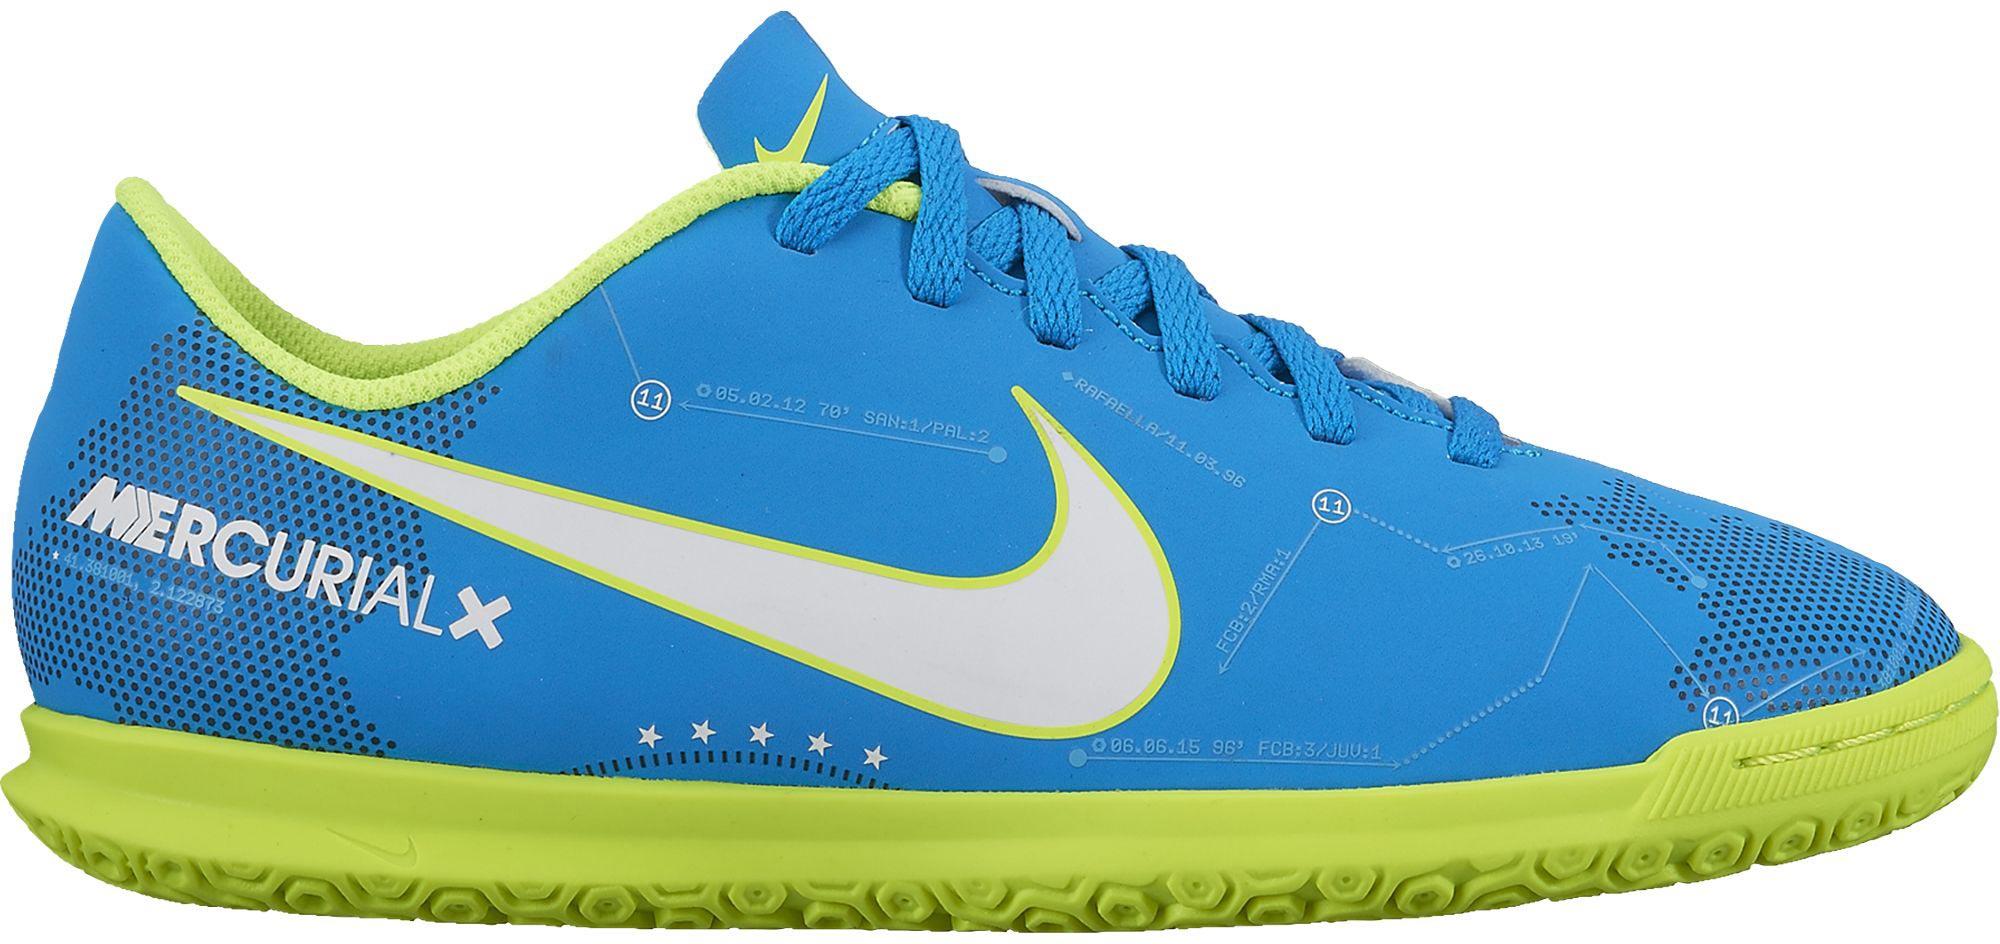 buy popular c8b99 374a4 Nike MERCURIALX VORTEX III NJR IC | sportisimo.com